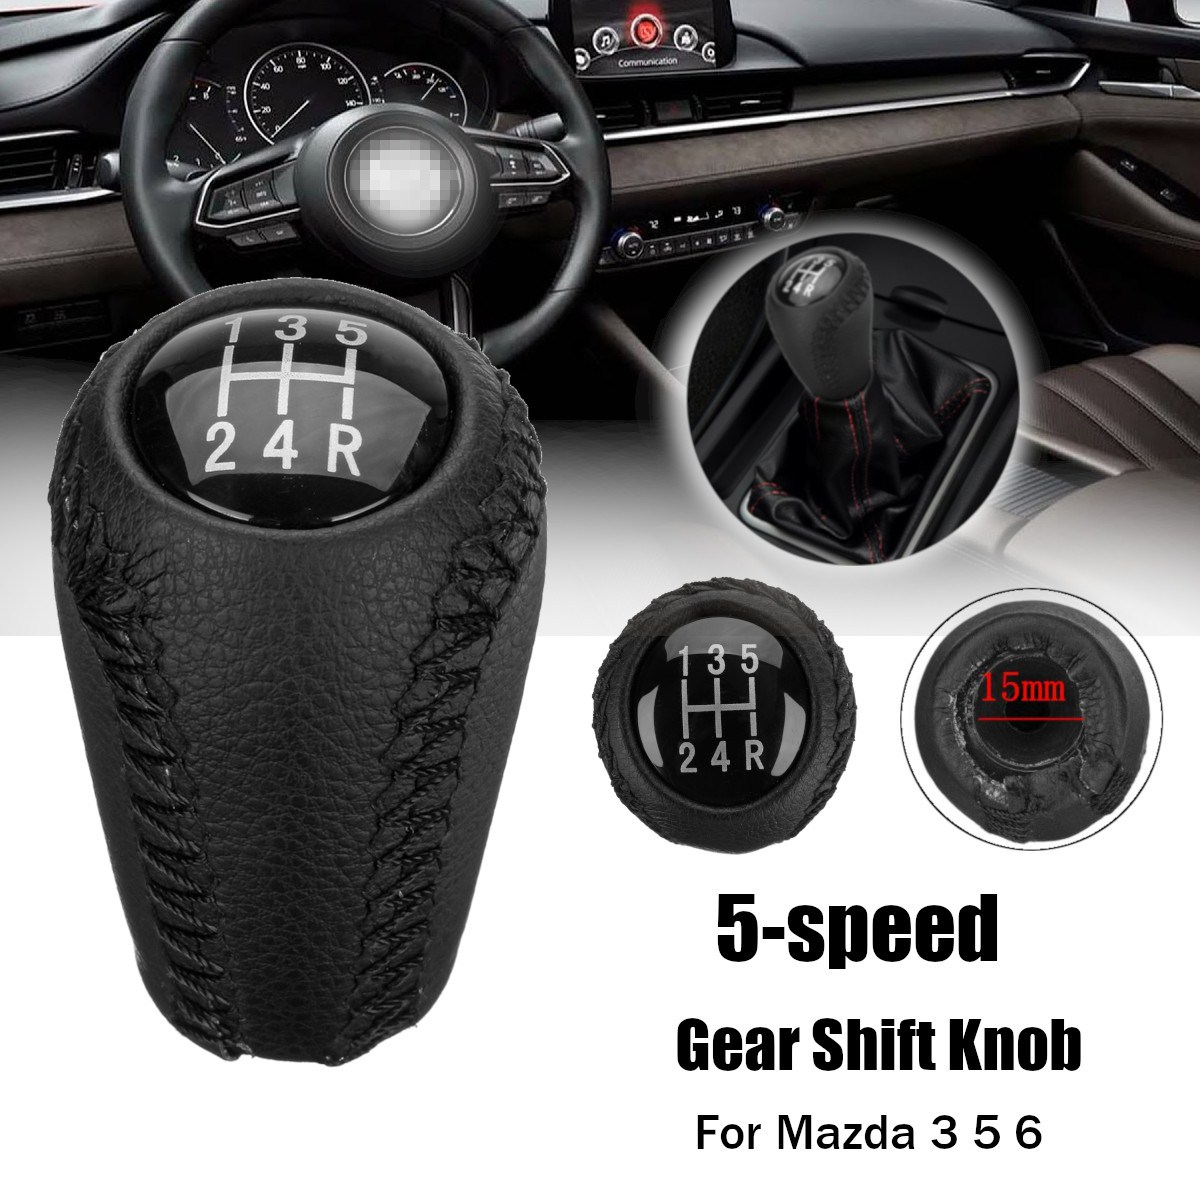 PQY 6 Speed Manual Gear Shift Knob Ball Shifting Stick Handle Vehicle Shifter Lever Head for Universal Automatic Transmission Car M12x1.25 M10x1.5 M10x1.25 M8x1.25